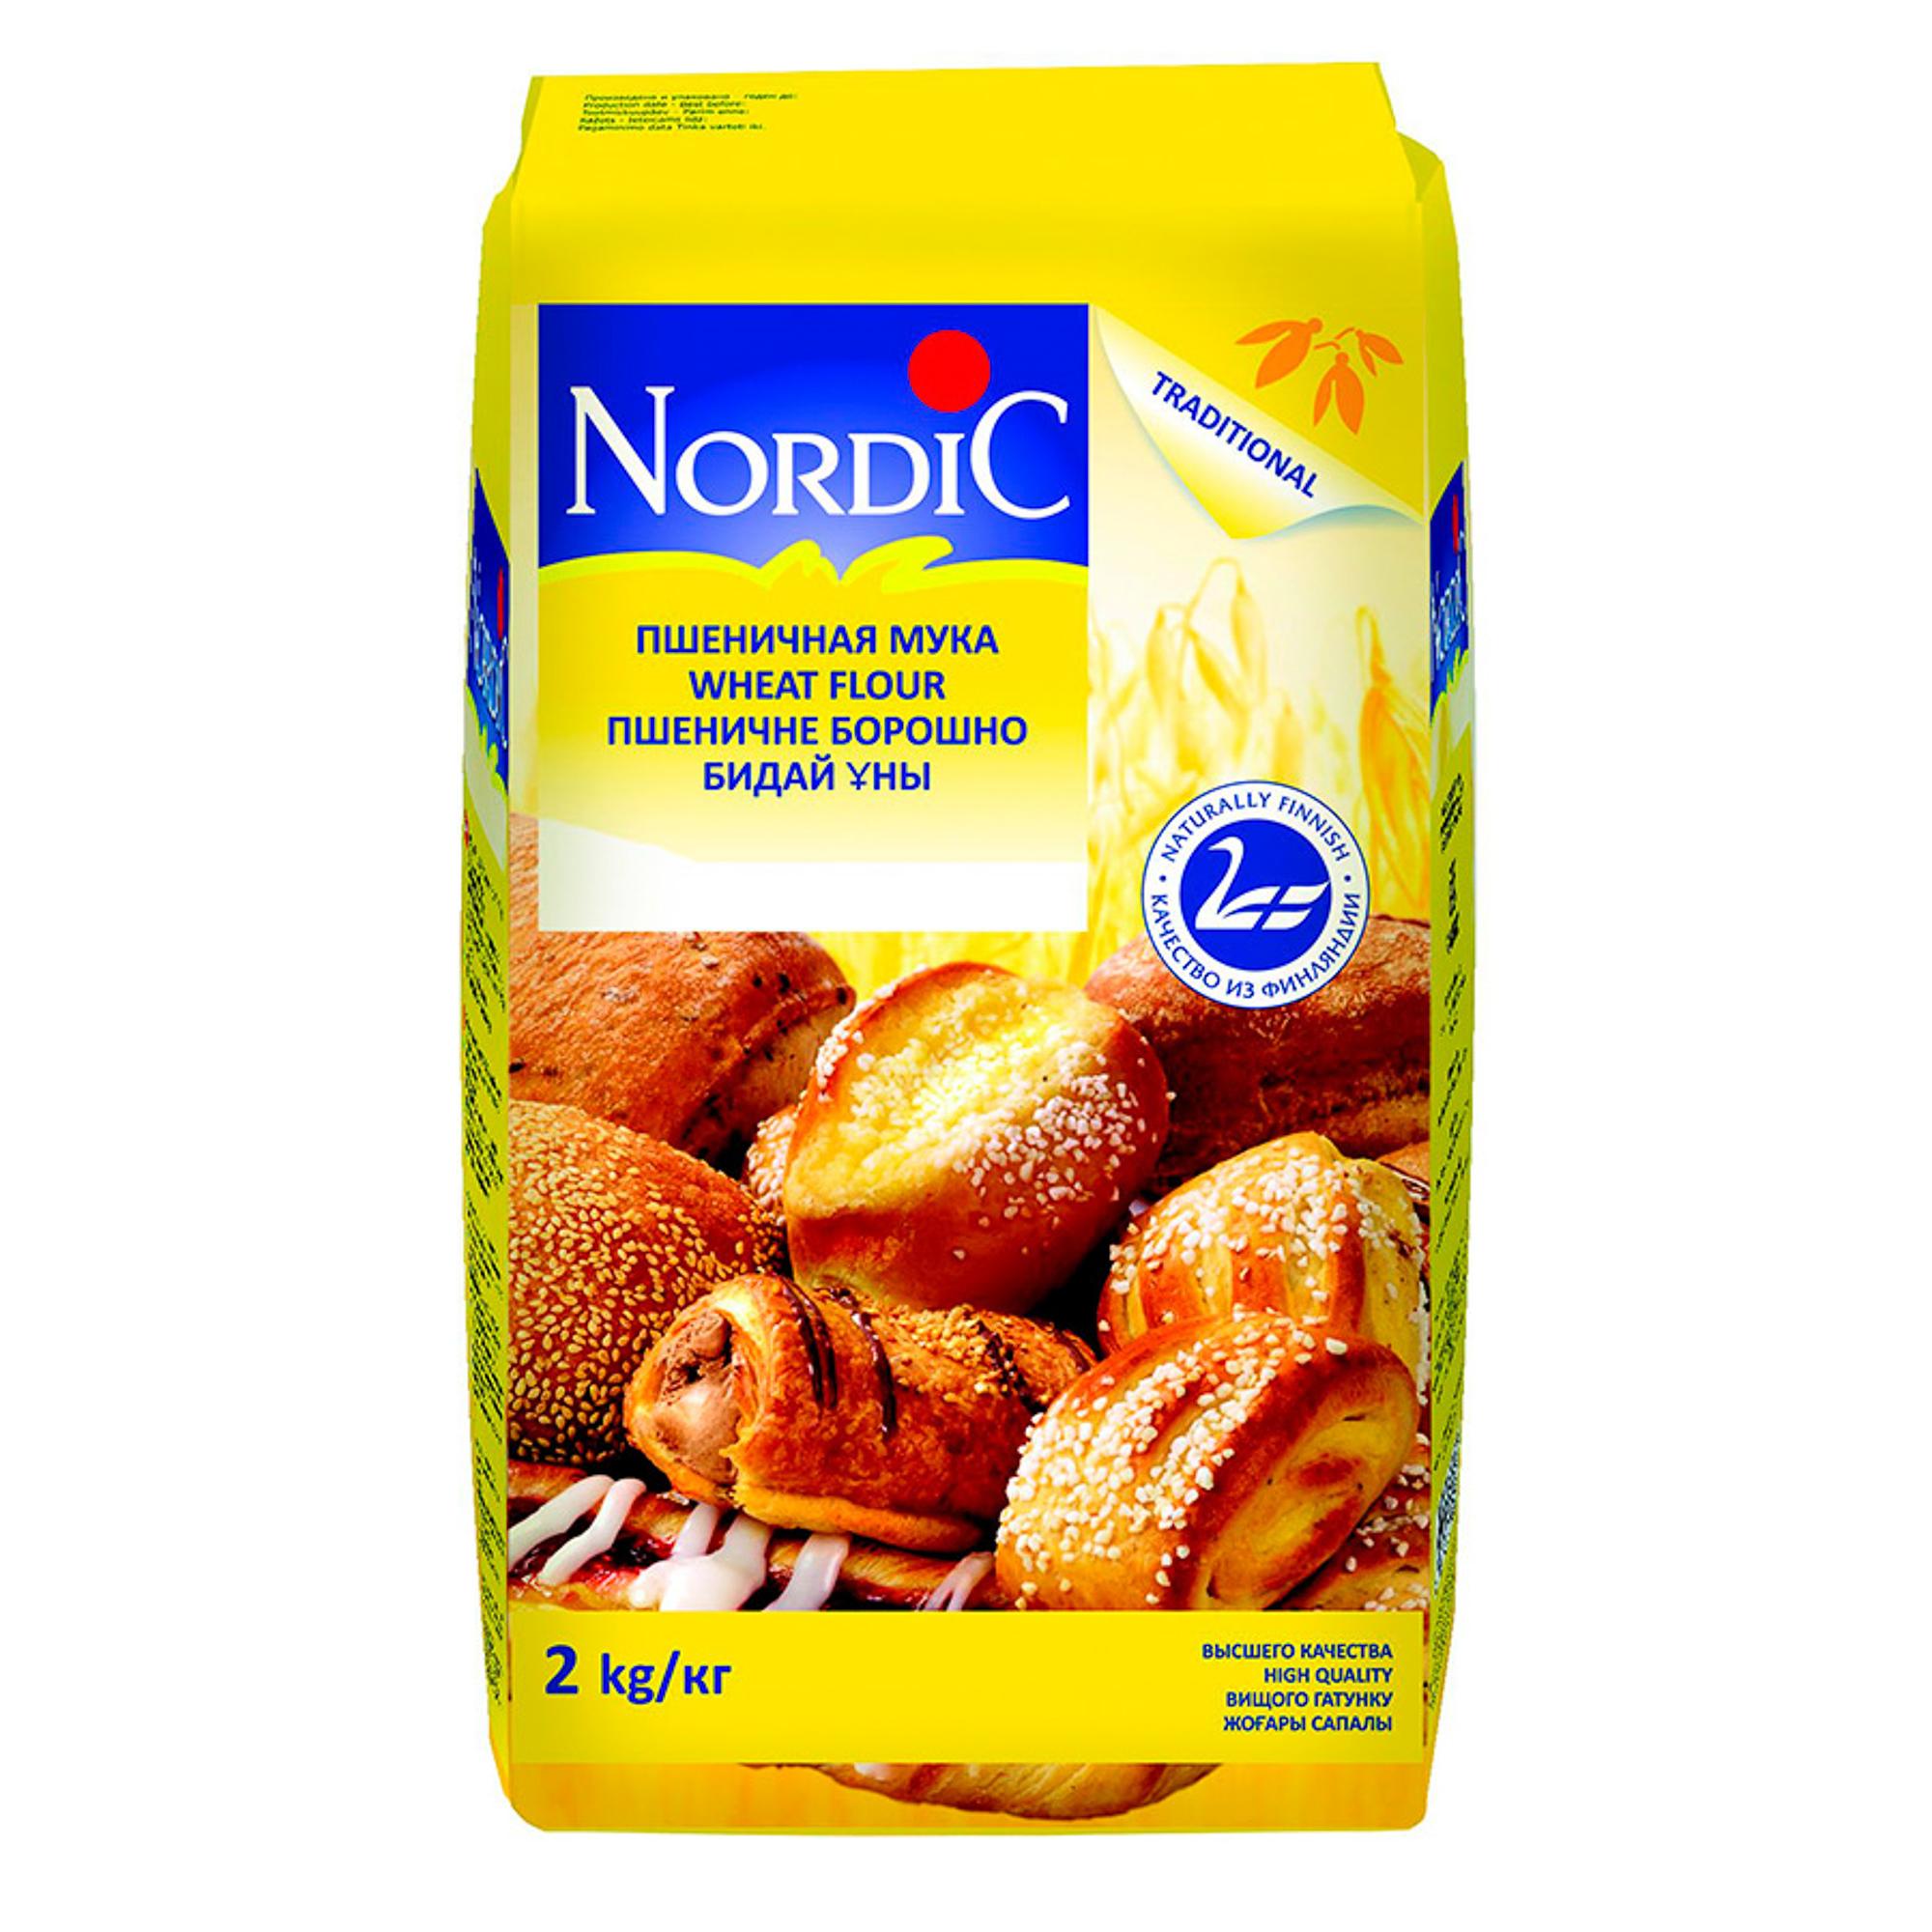 Мука Nordic пшеничная 2 кг